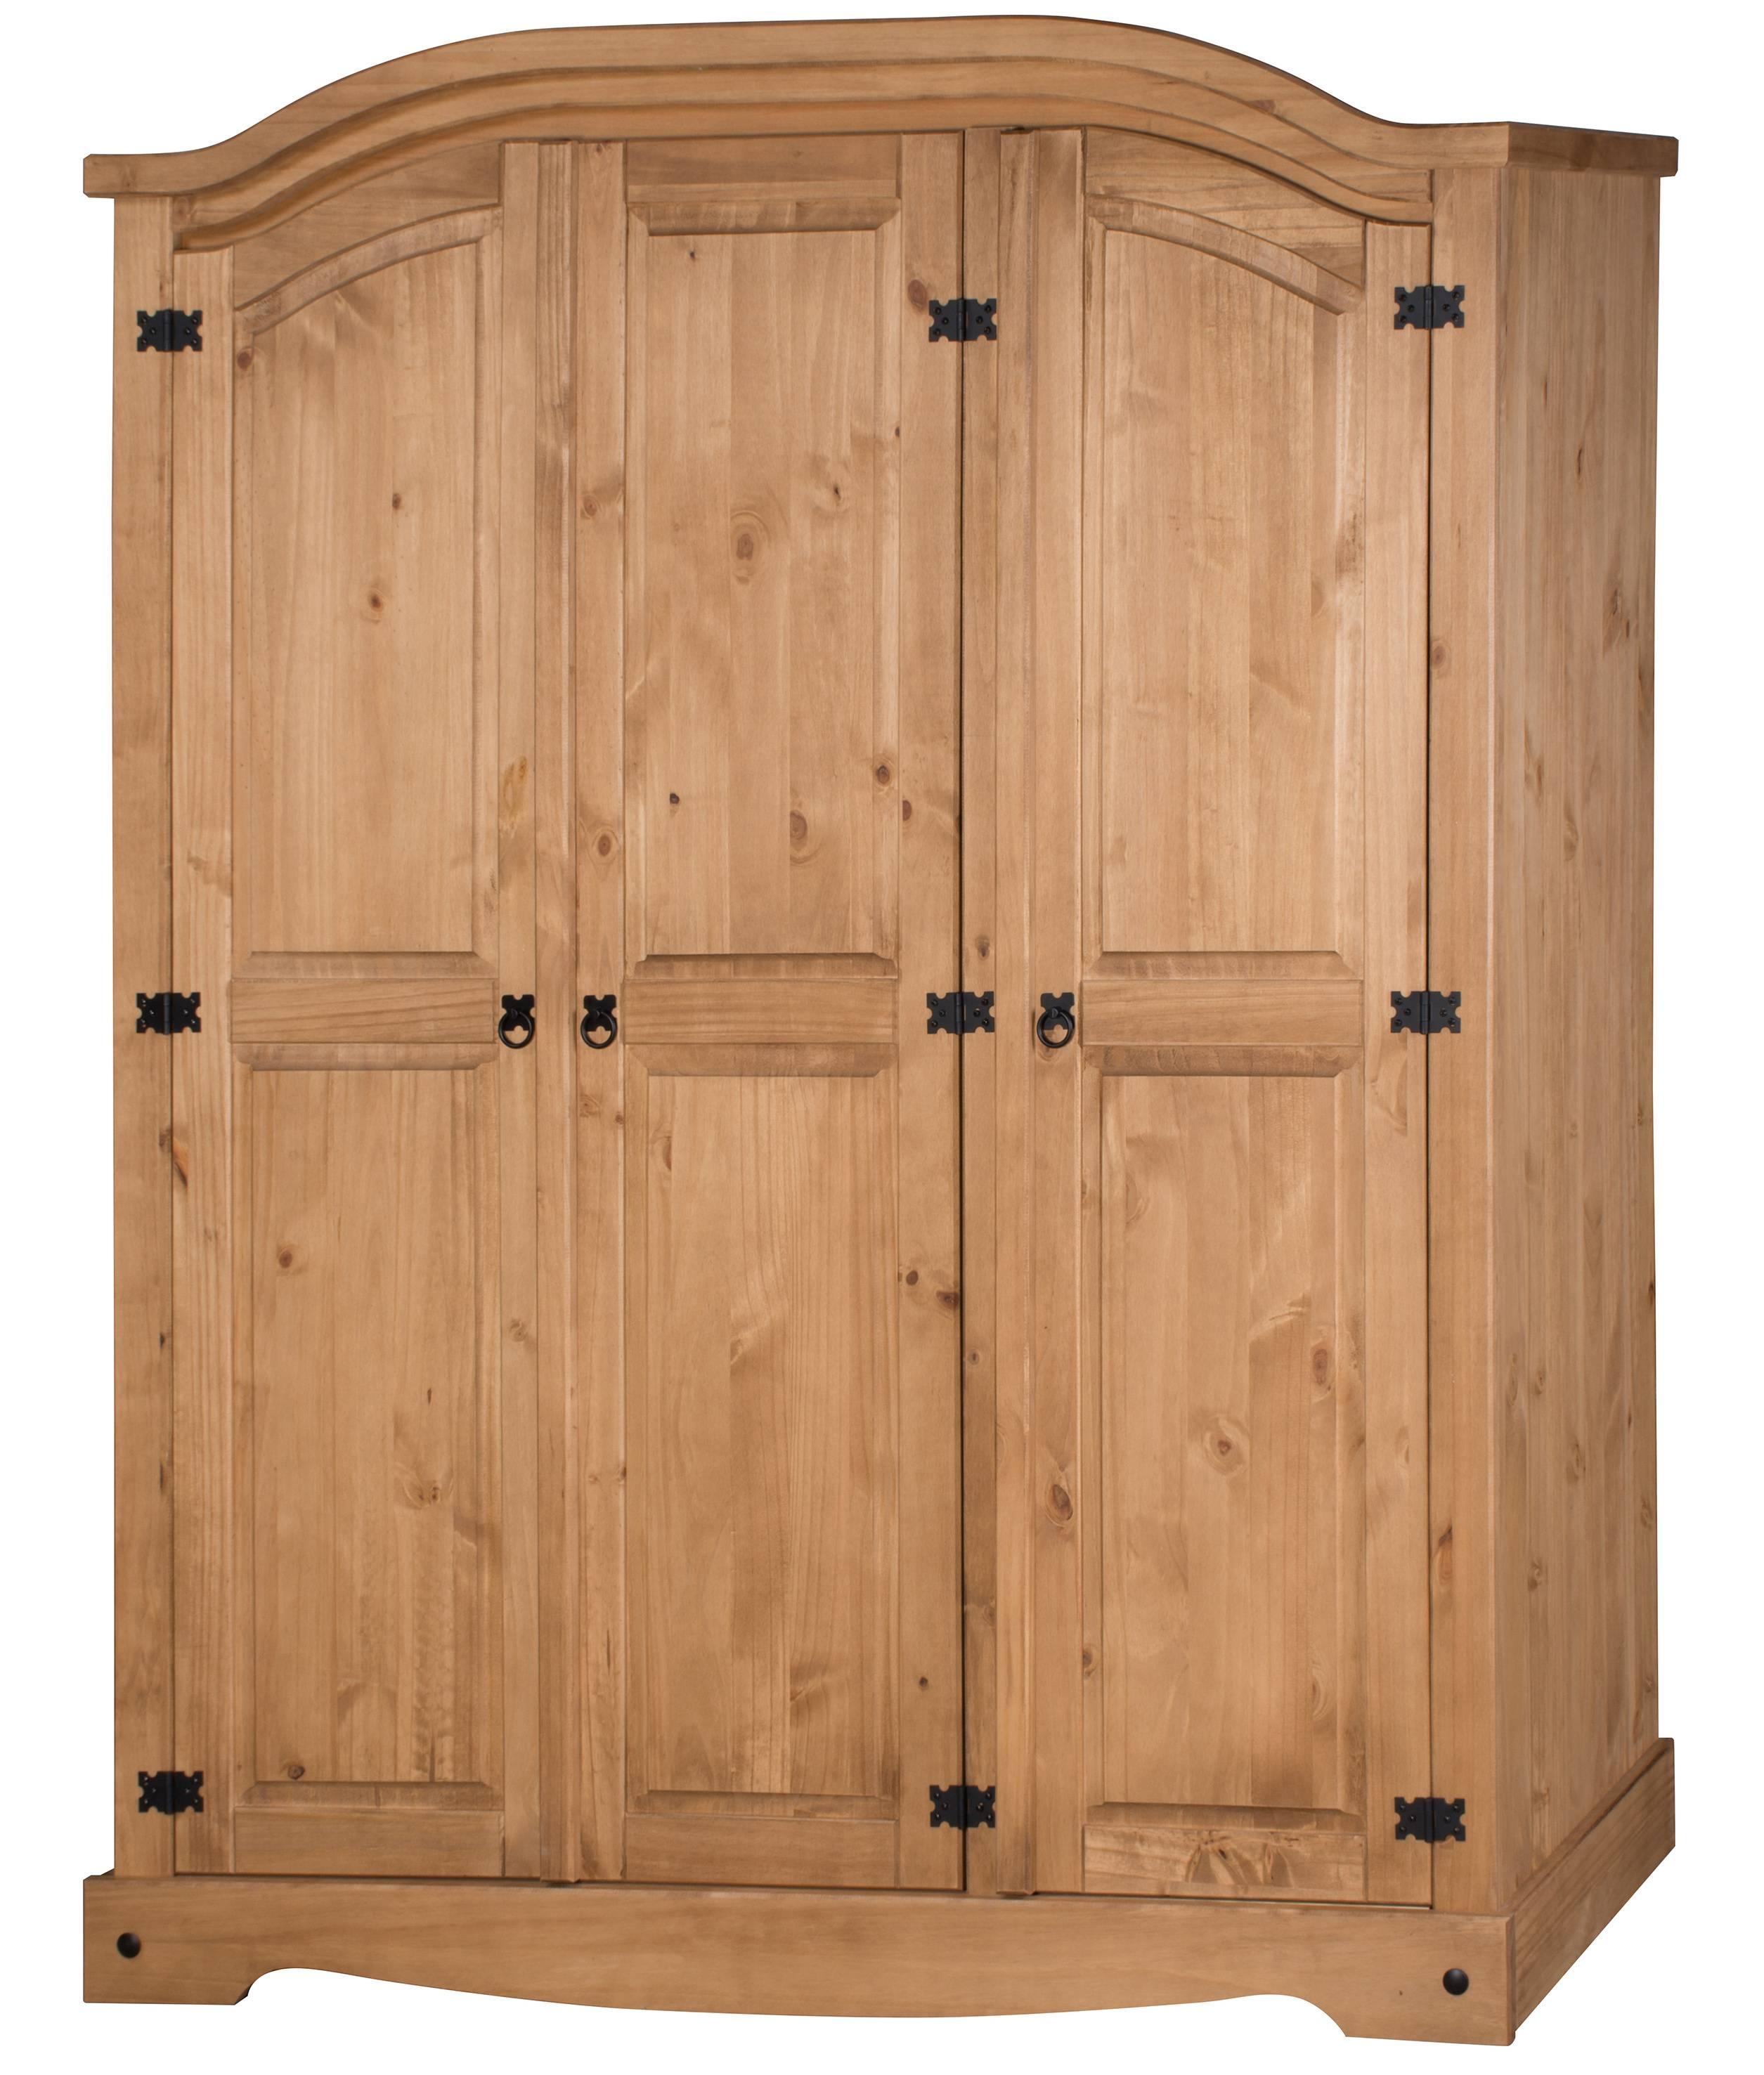 Corona 3 Door Arch Top Wardrobe with regard to Corona 3 Door Wardrobes (Image 6 of 15)